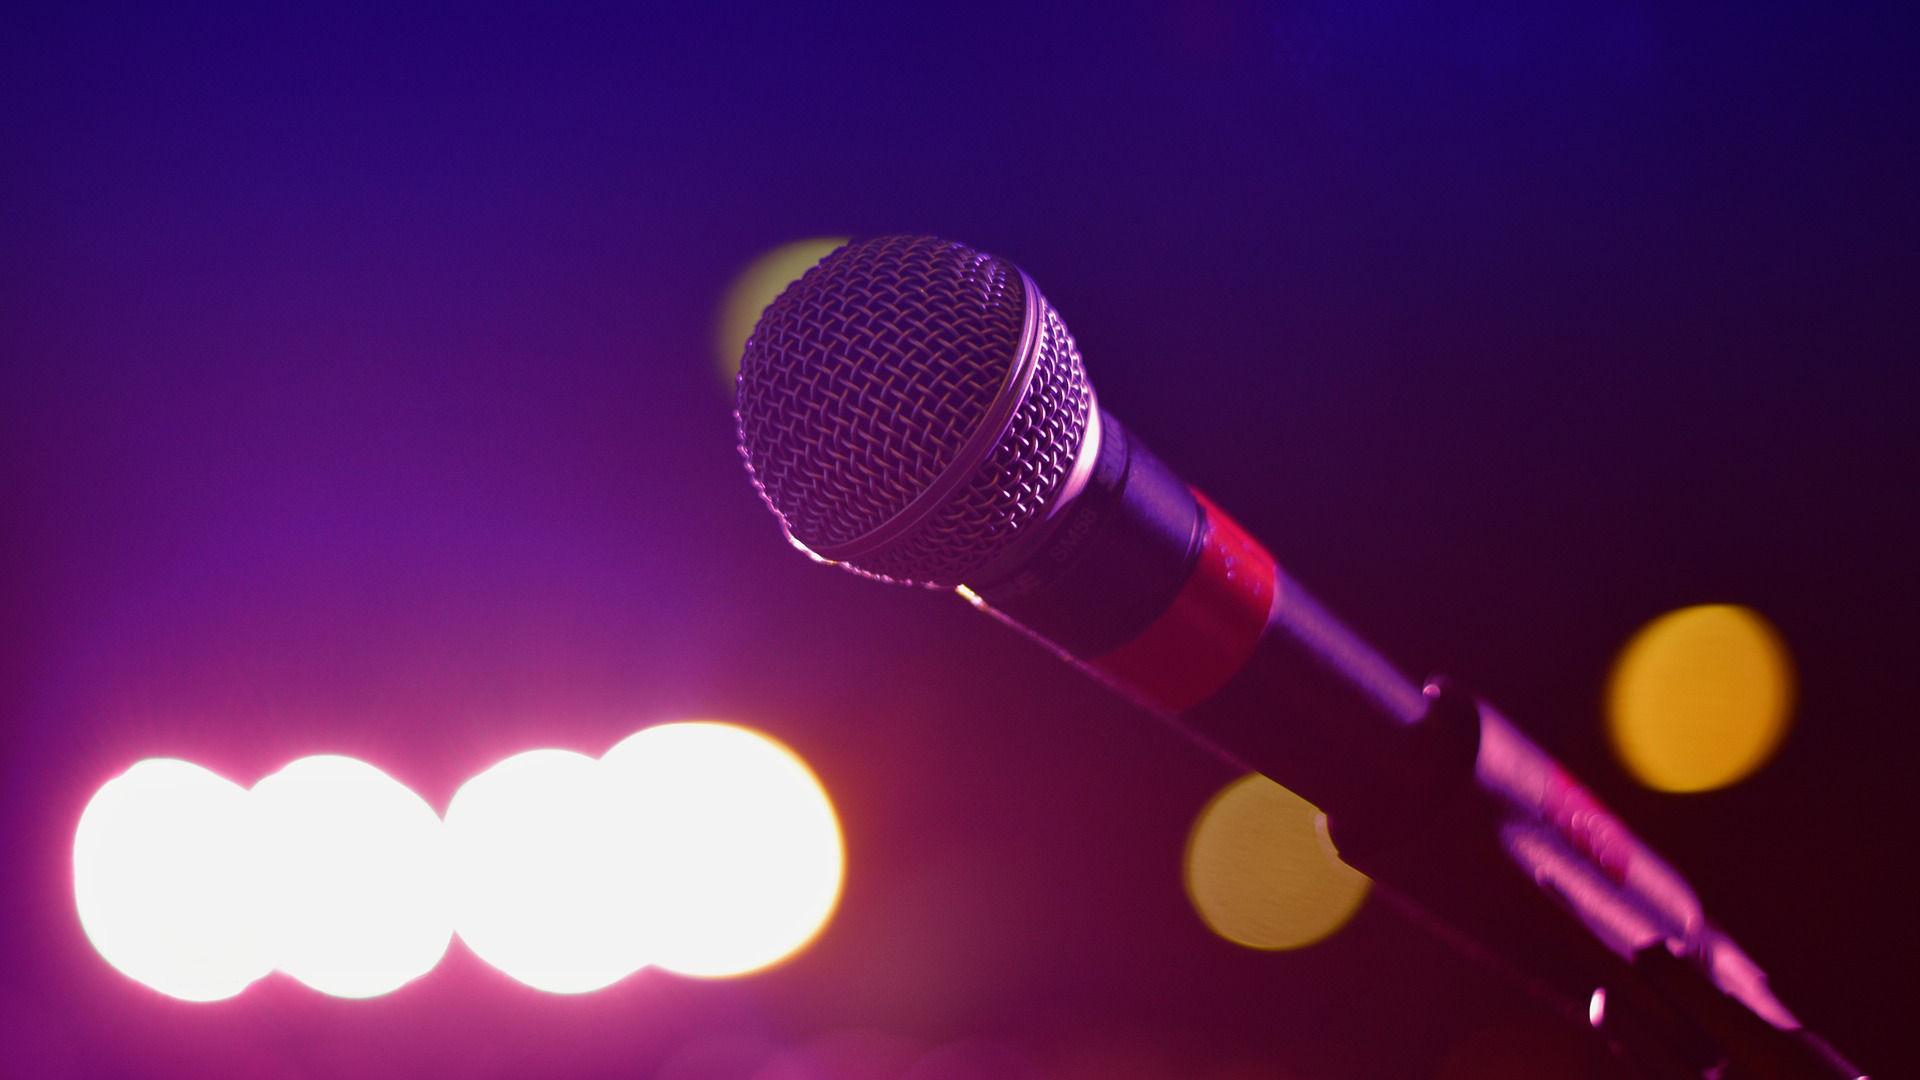 musikplatzhalter_pixabay